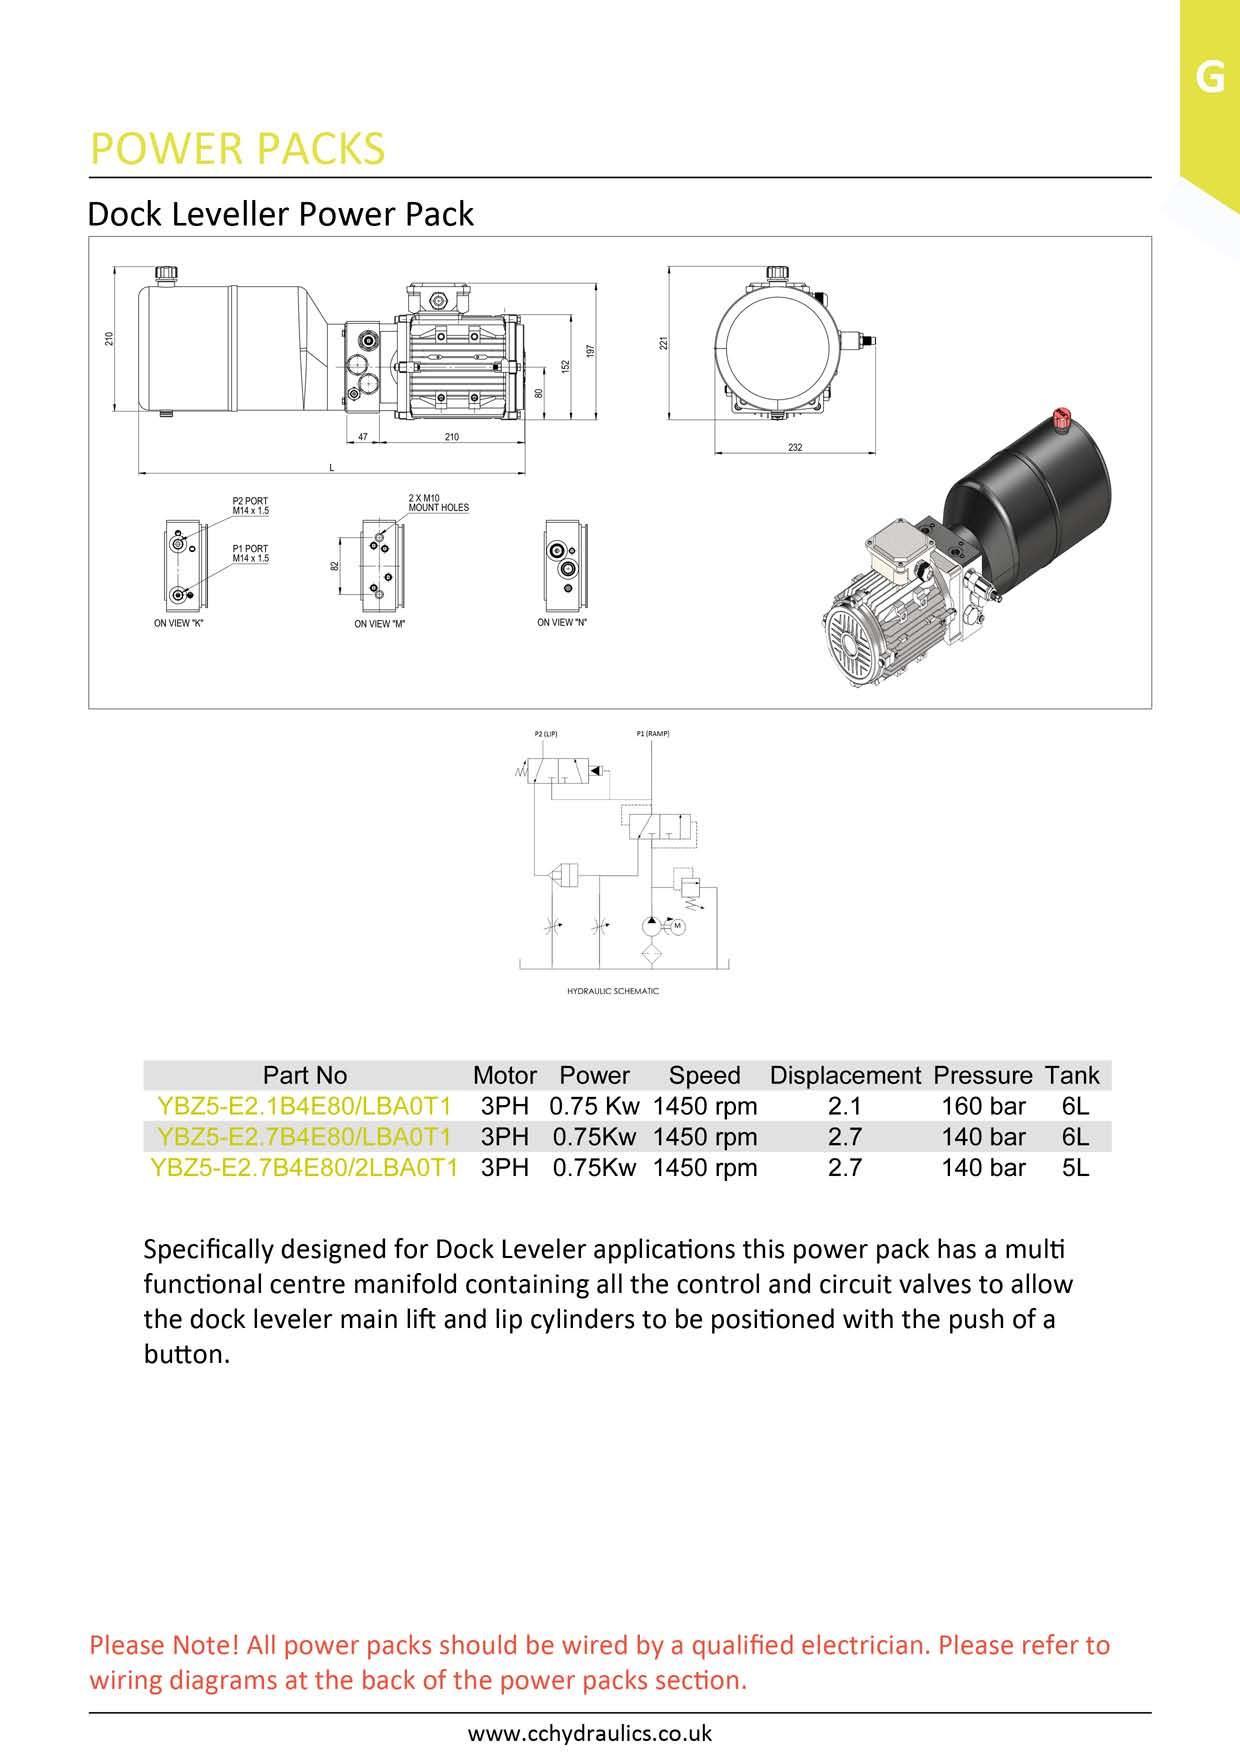 hight resolution of dock leveller power pack click